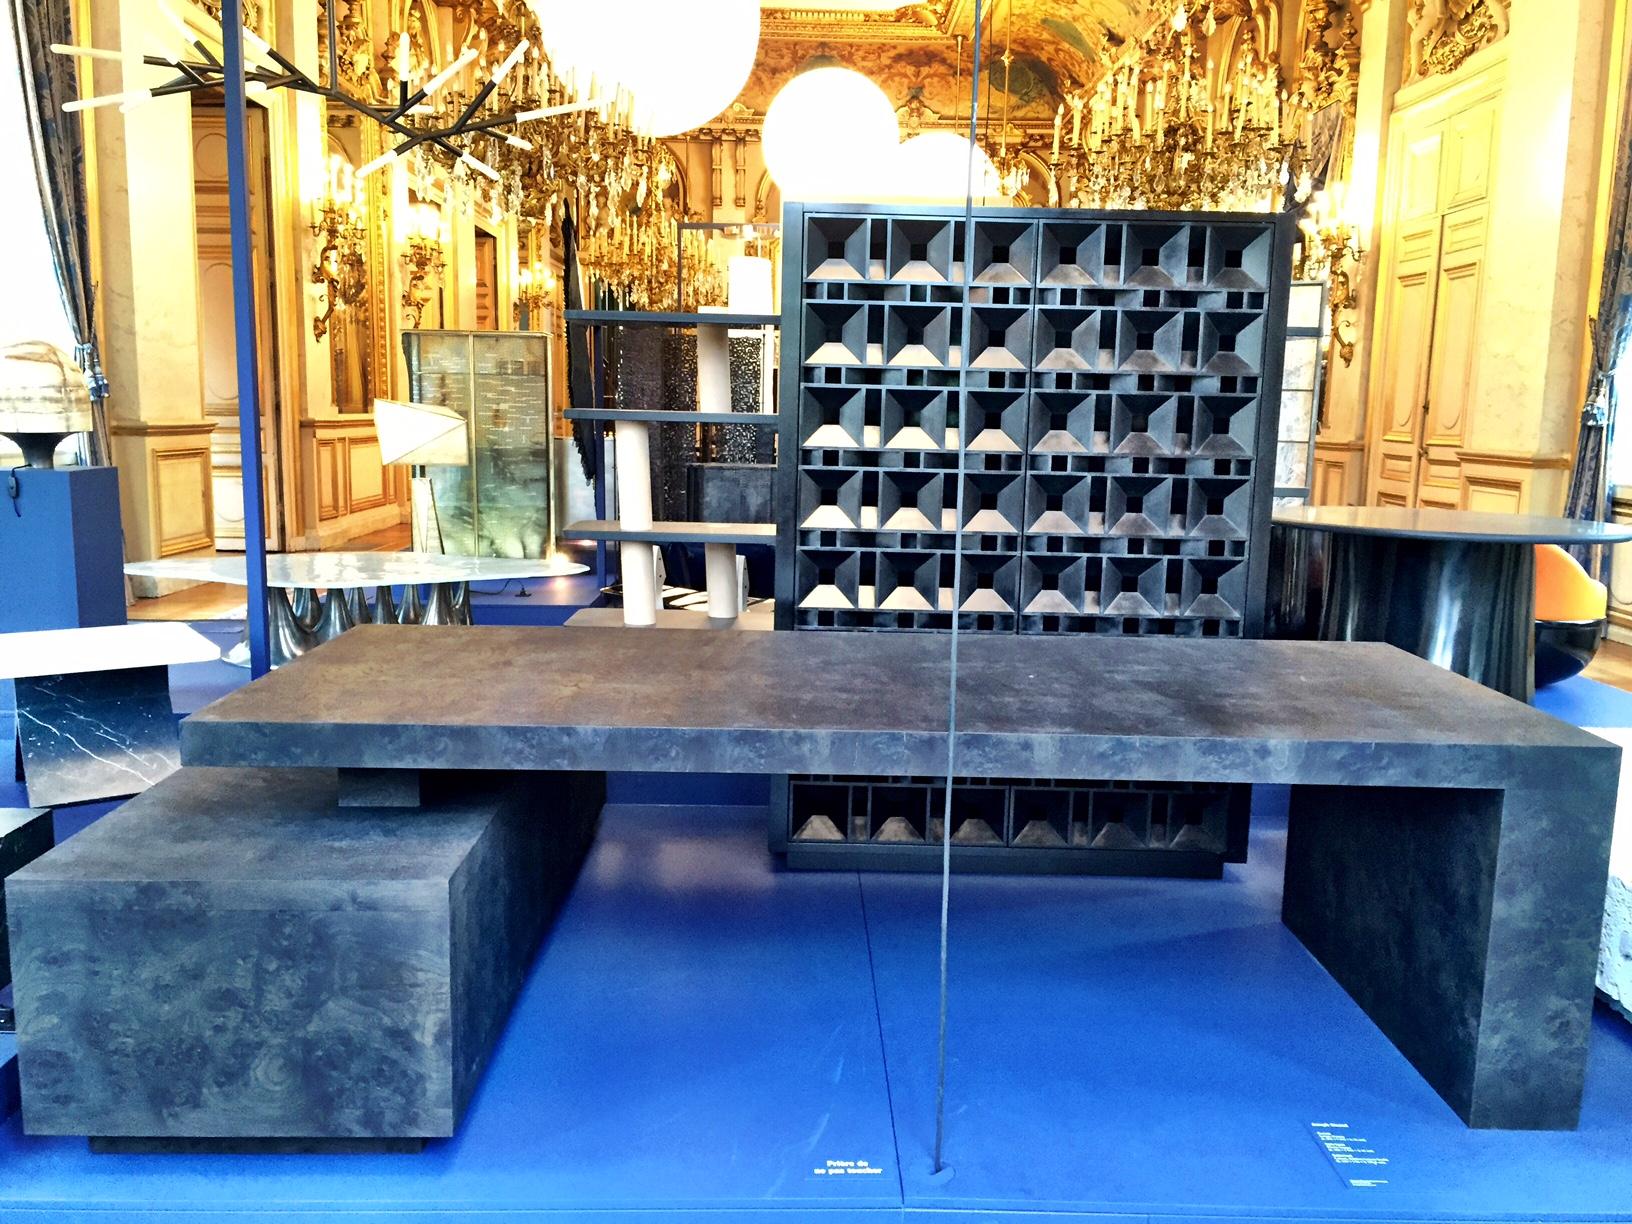 Ad collections at quai d orsay paris